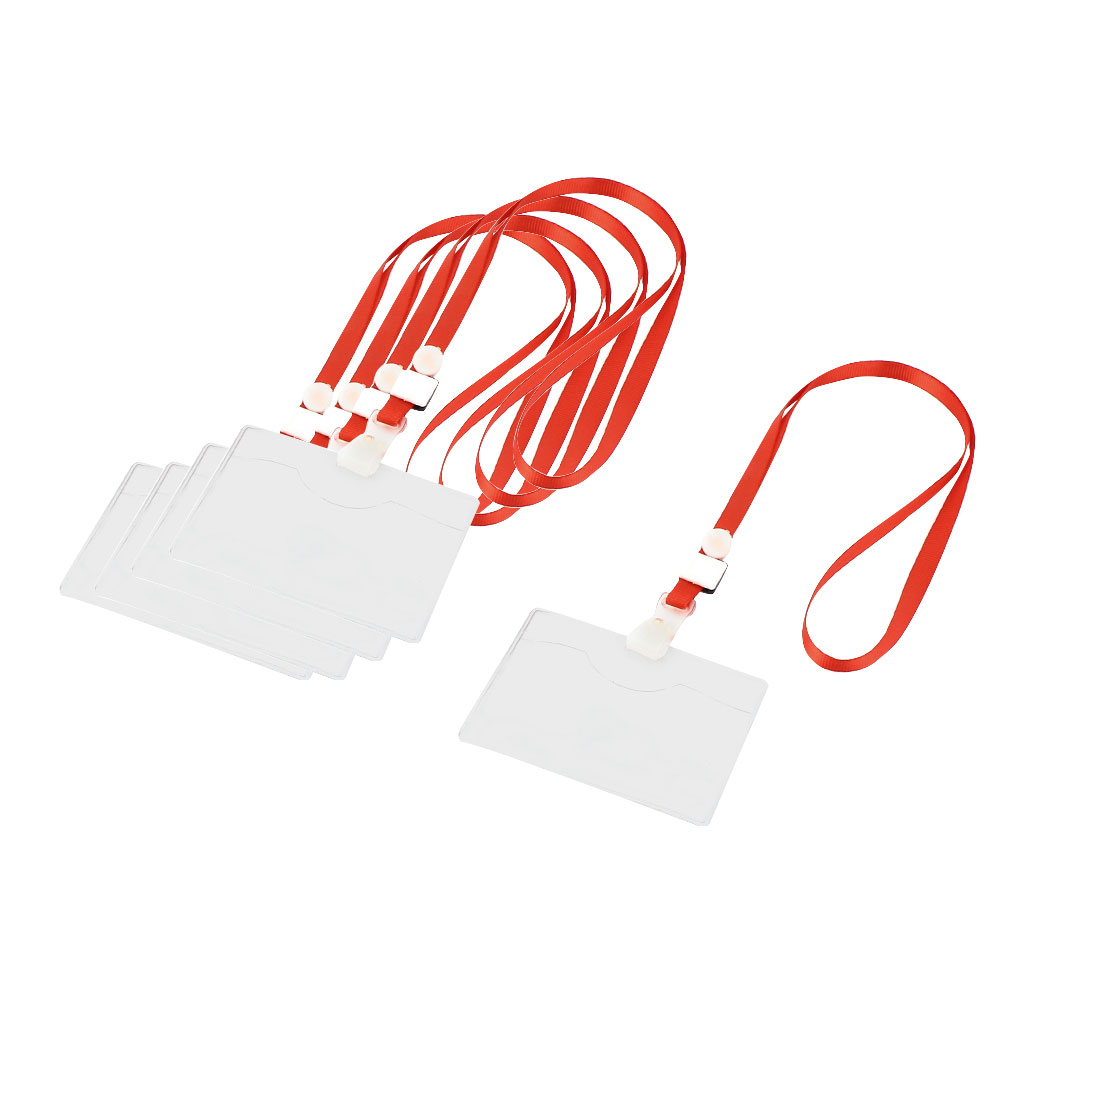 5pcs ID Card Name Tag Clip Neck Strap Lanyards Red w Horizontal Badge Holder